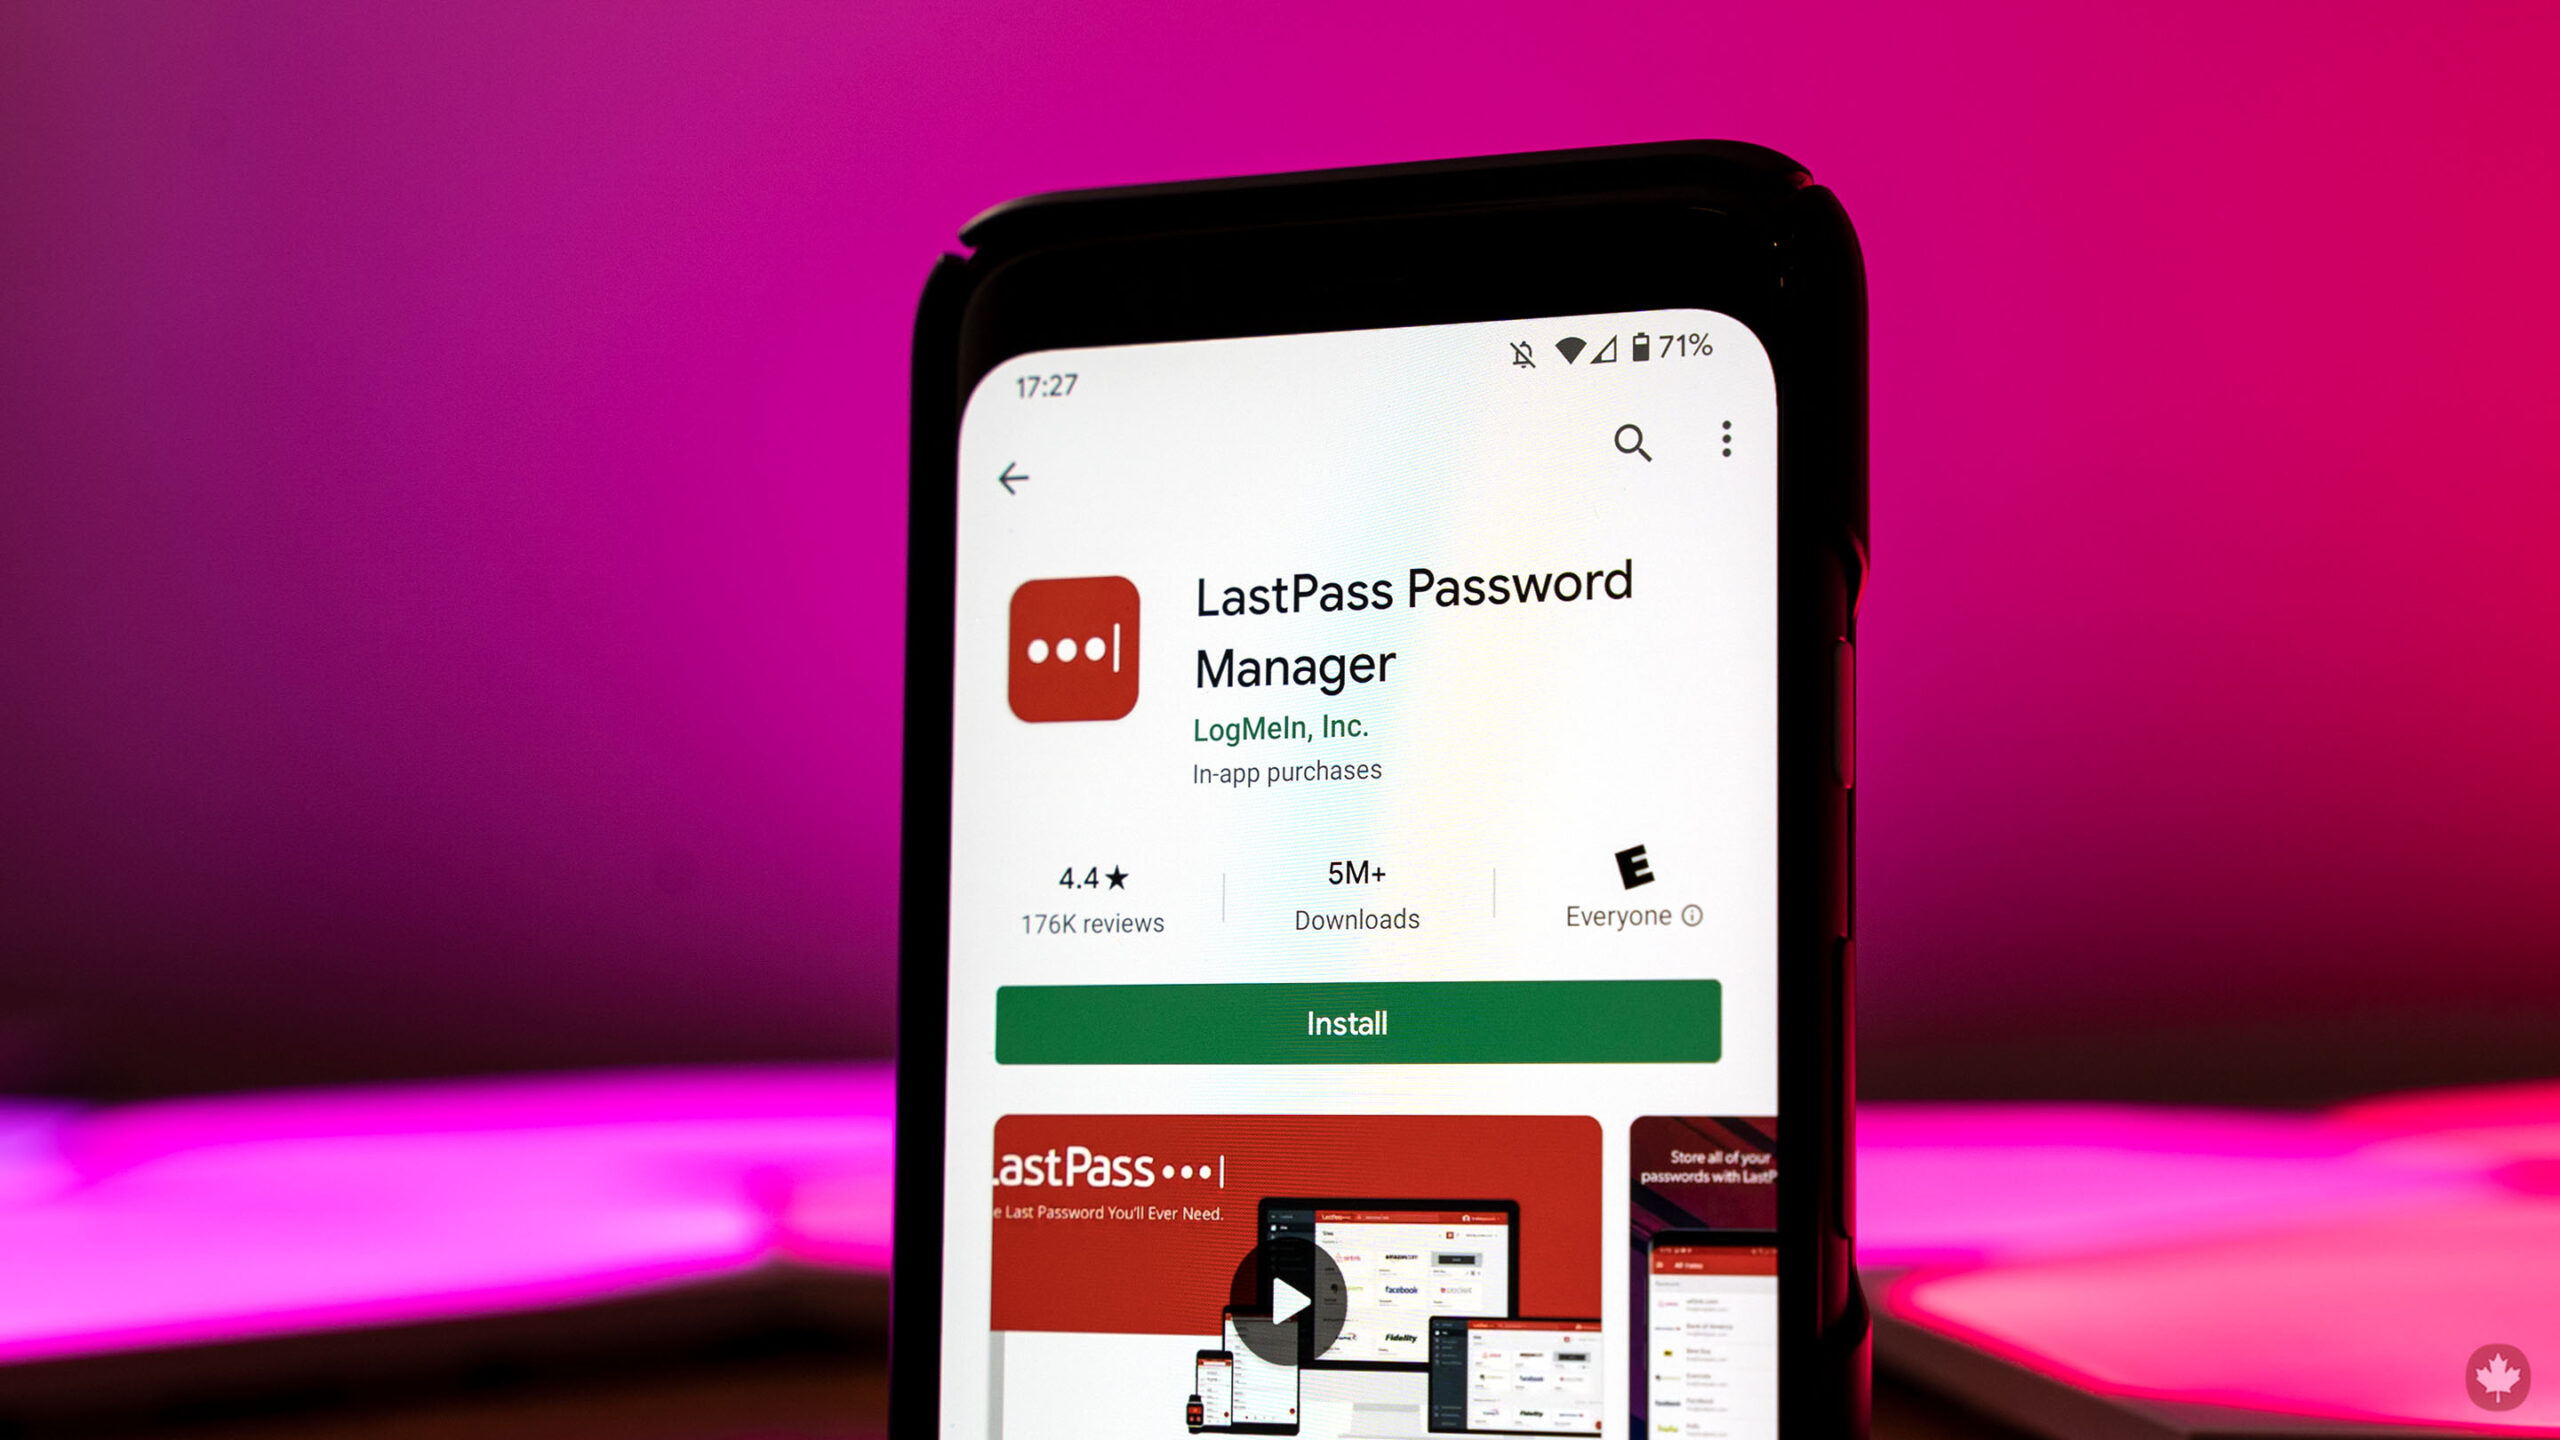 LastPass on Android